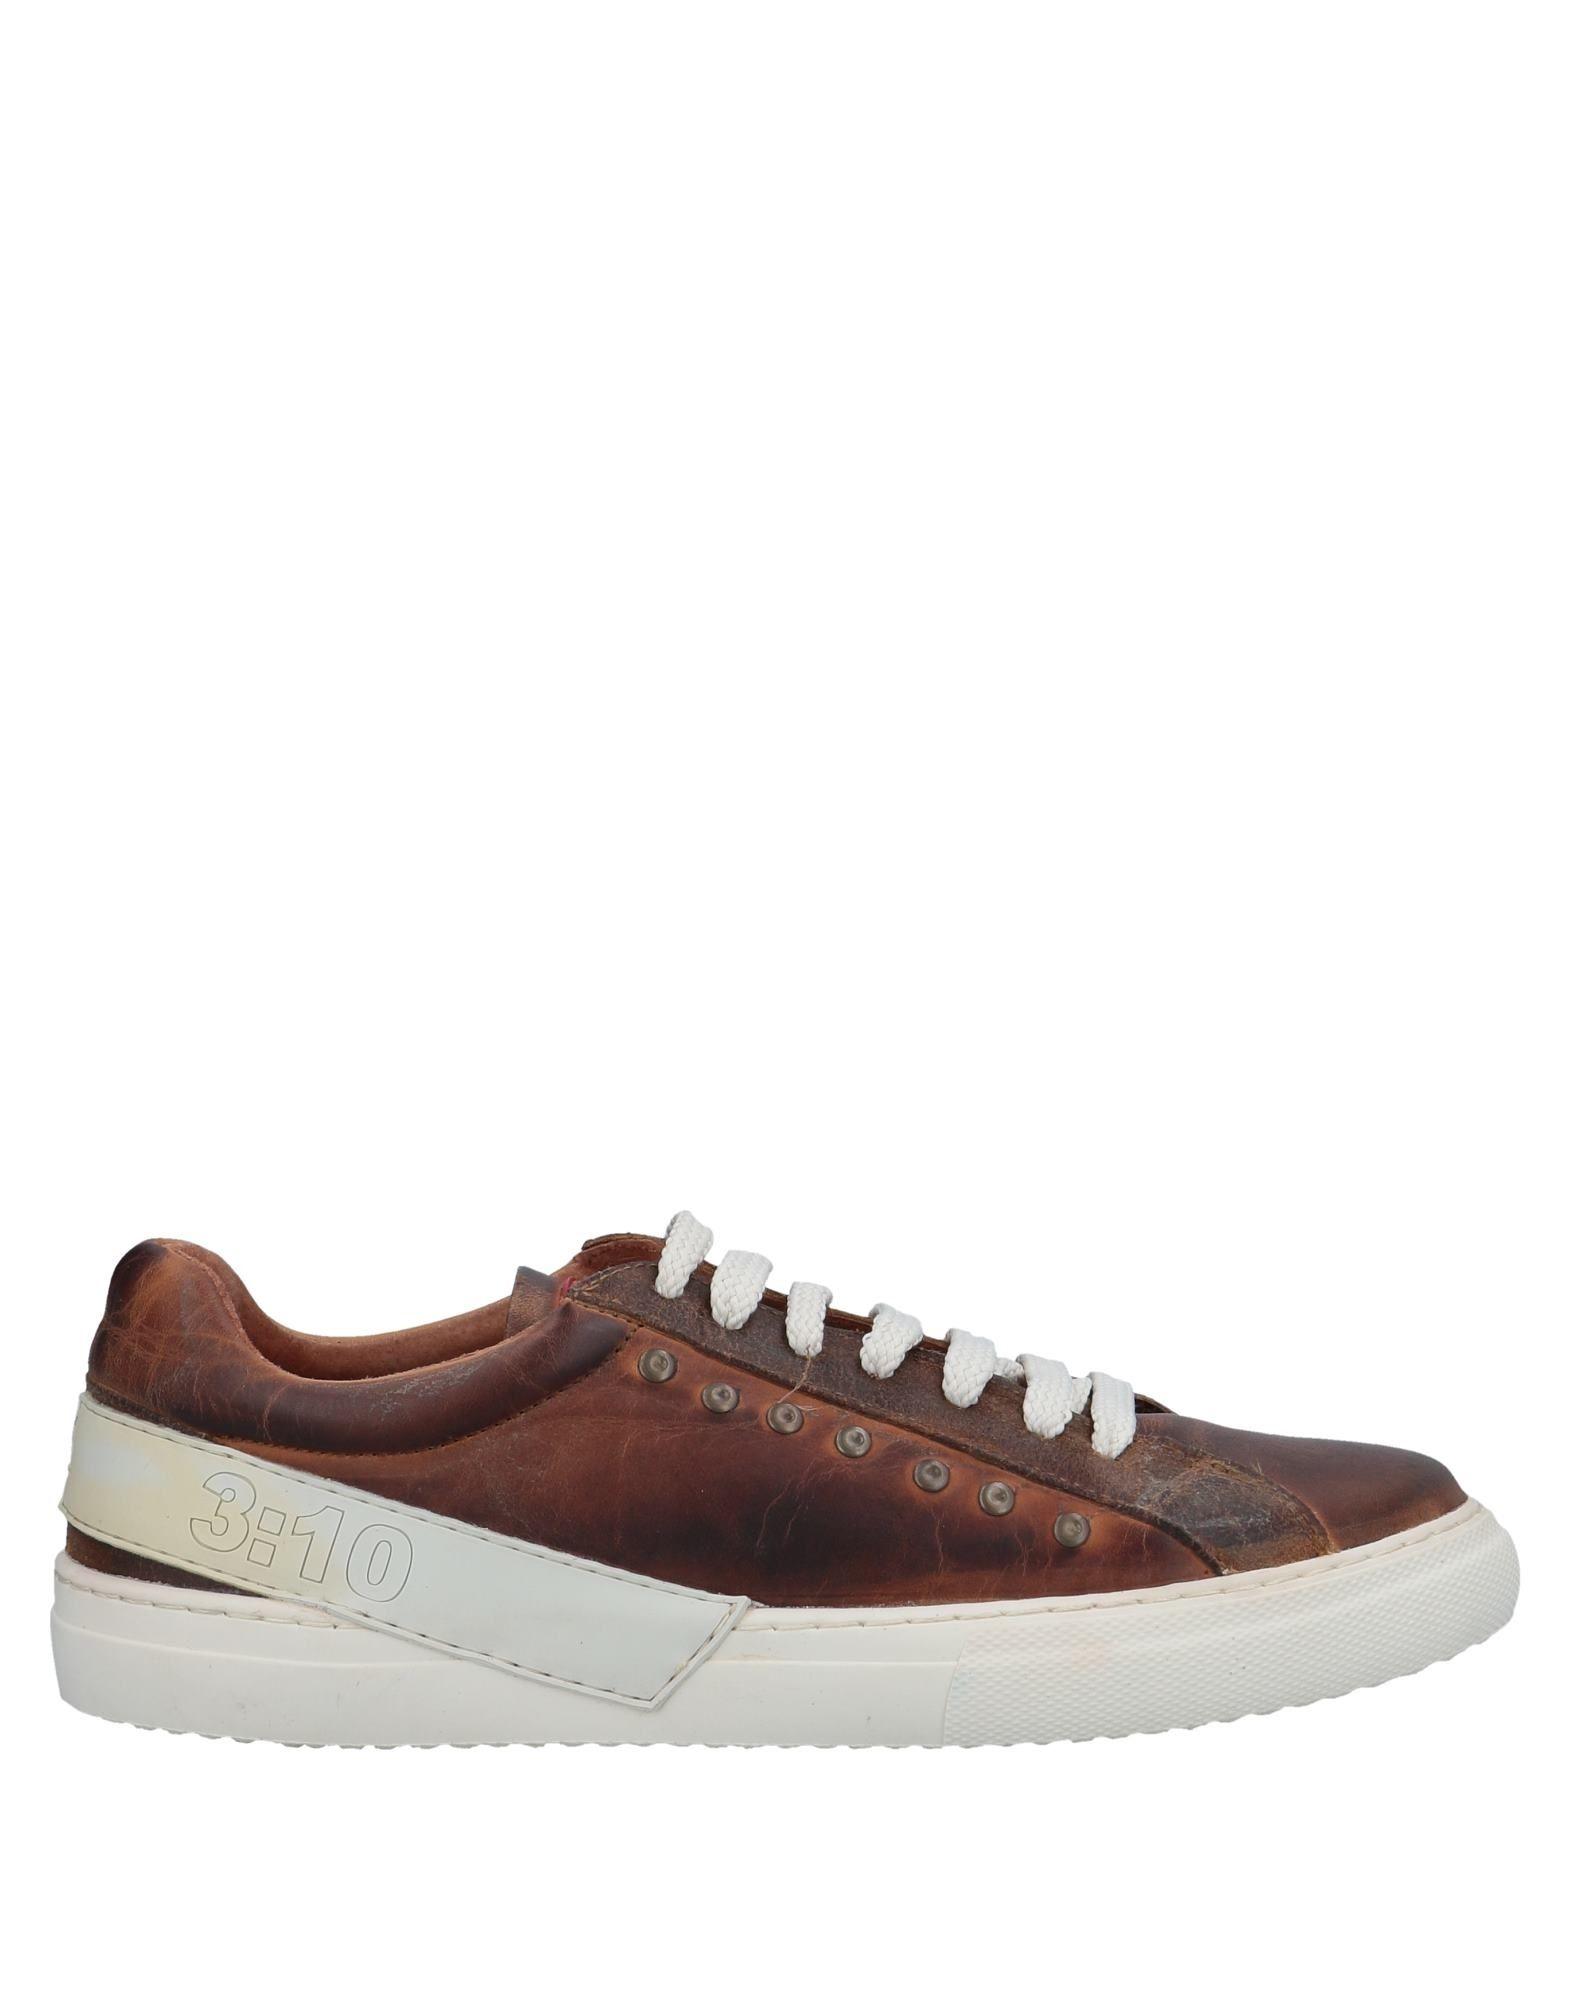 3:10 Sneakers - Australia Men 3:10 Sneakers online on  Australia - - 11556065VK 5f8d20